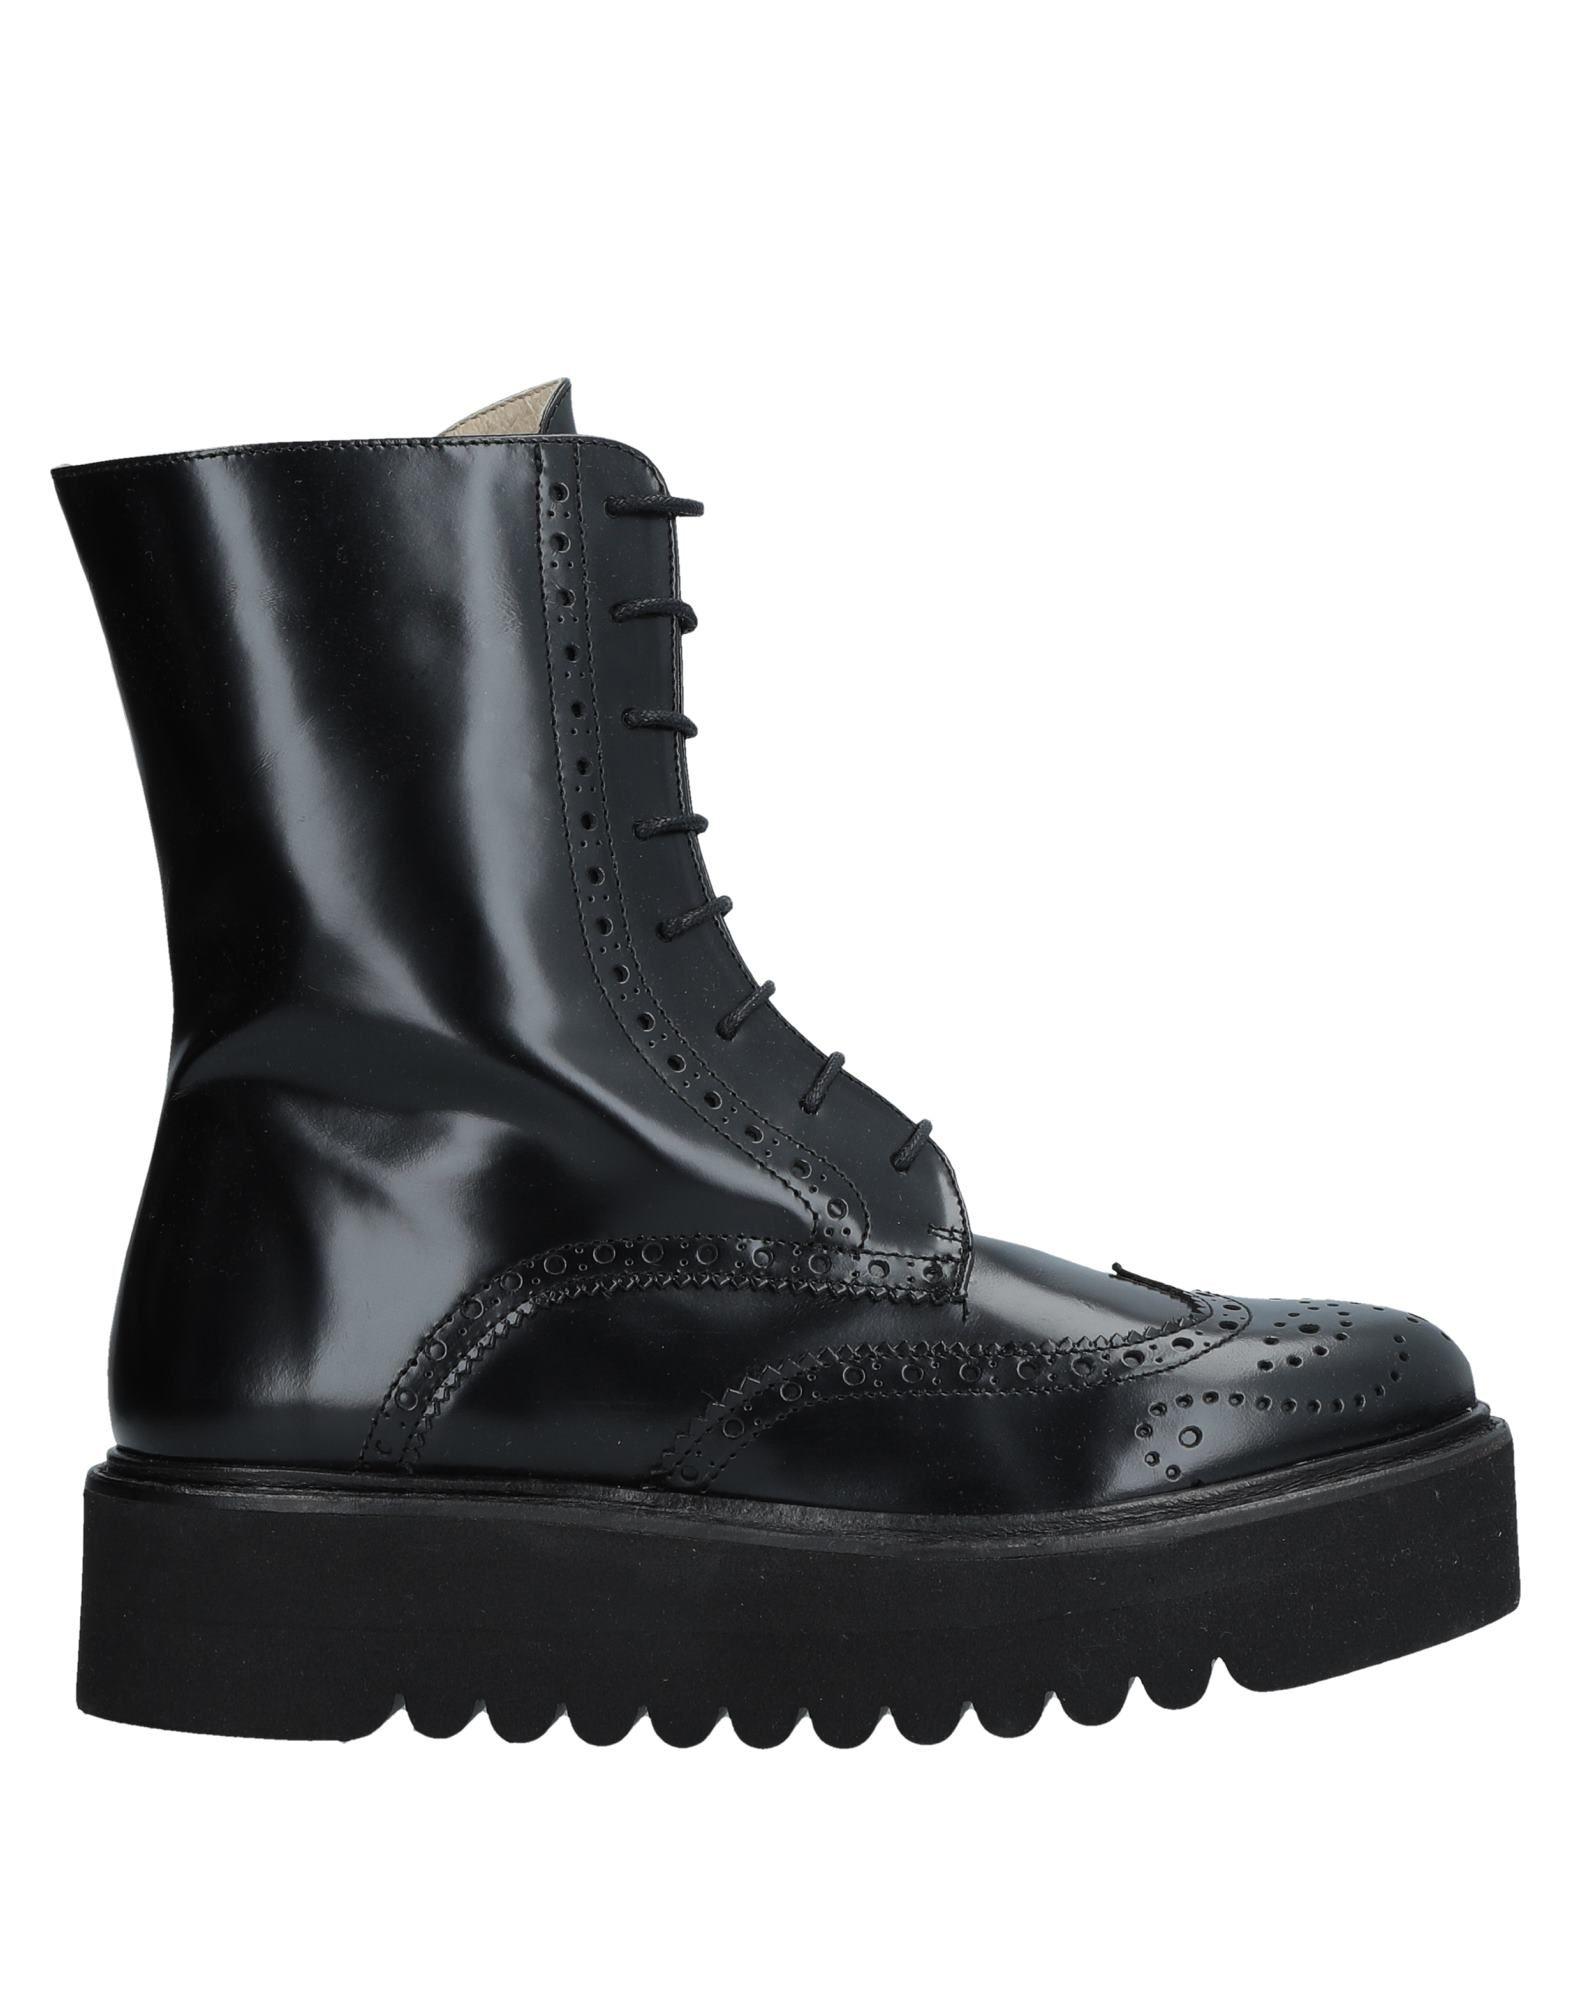 Palomitas By Paloma Barceló Stiefelette Damen  11539137SI Gute Qualität beliebte Schuhe